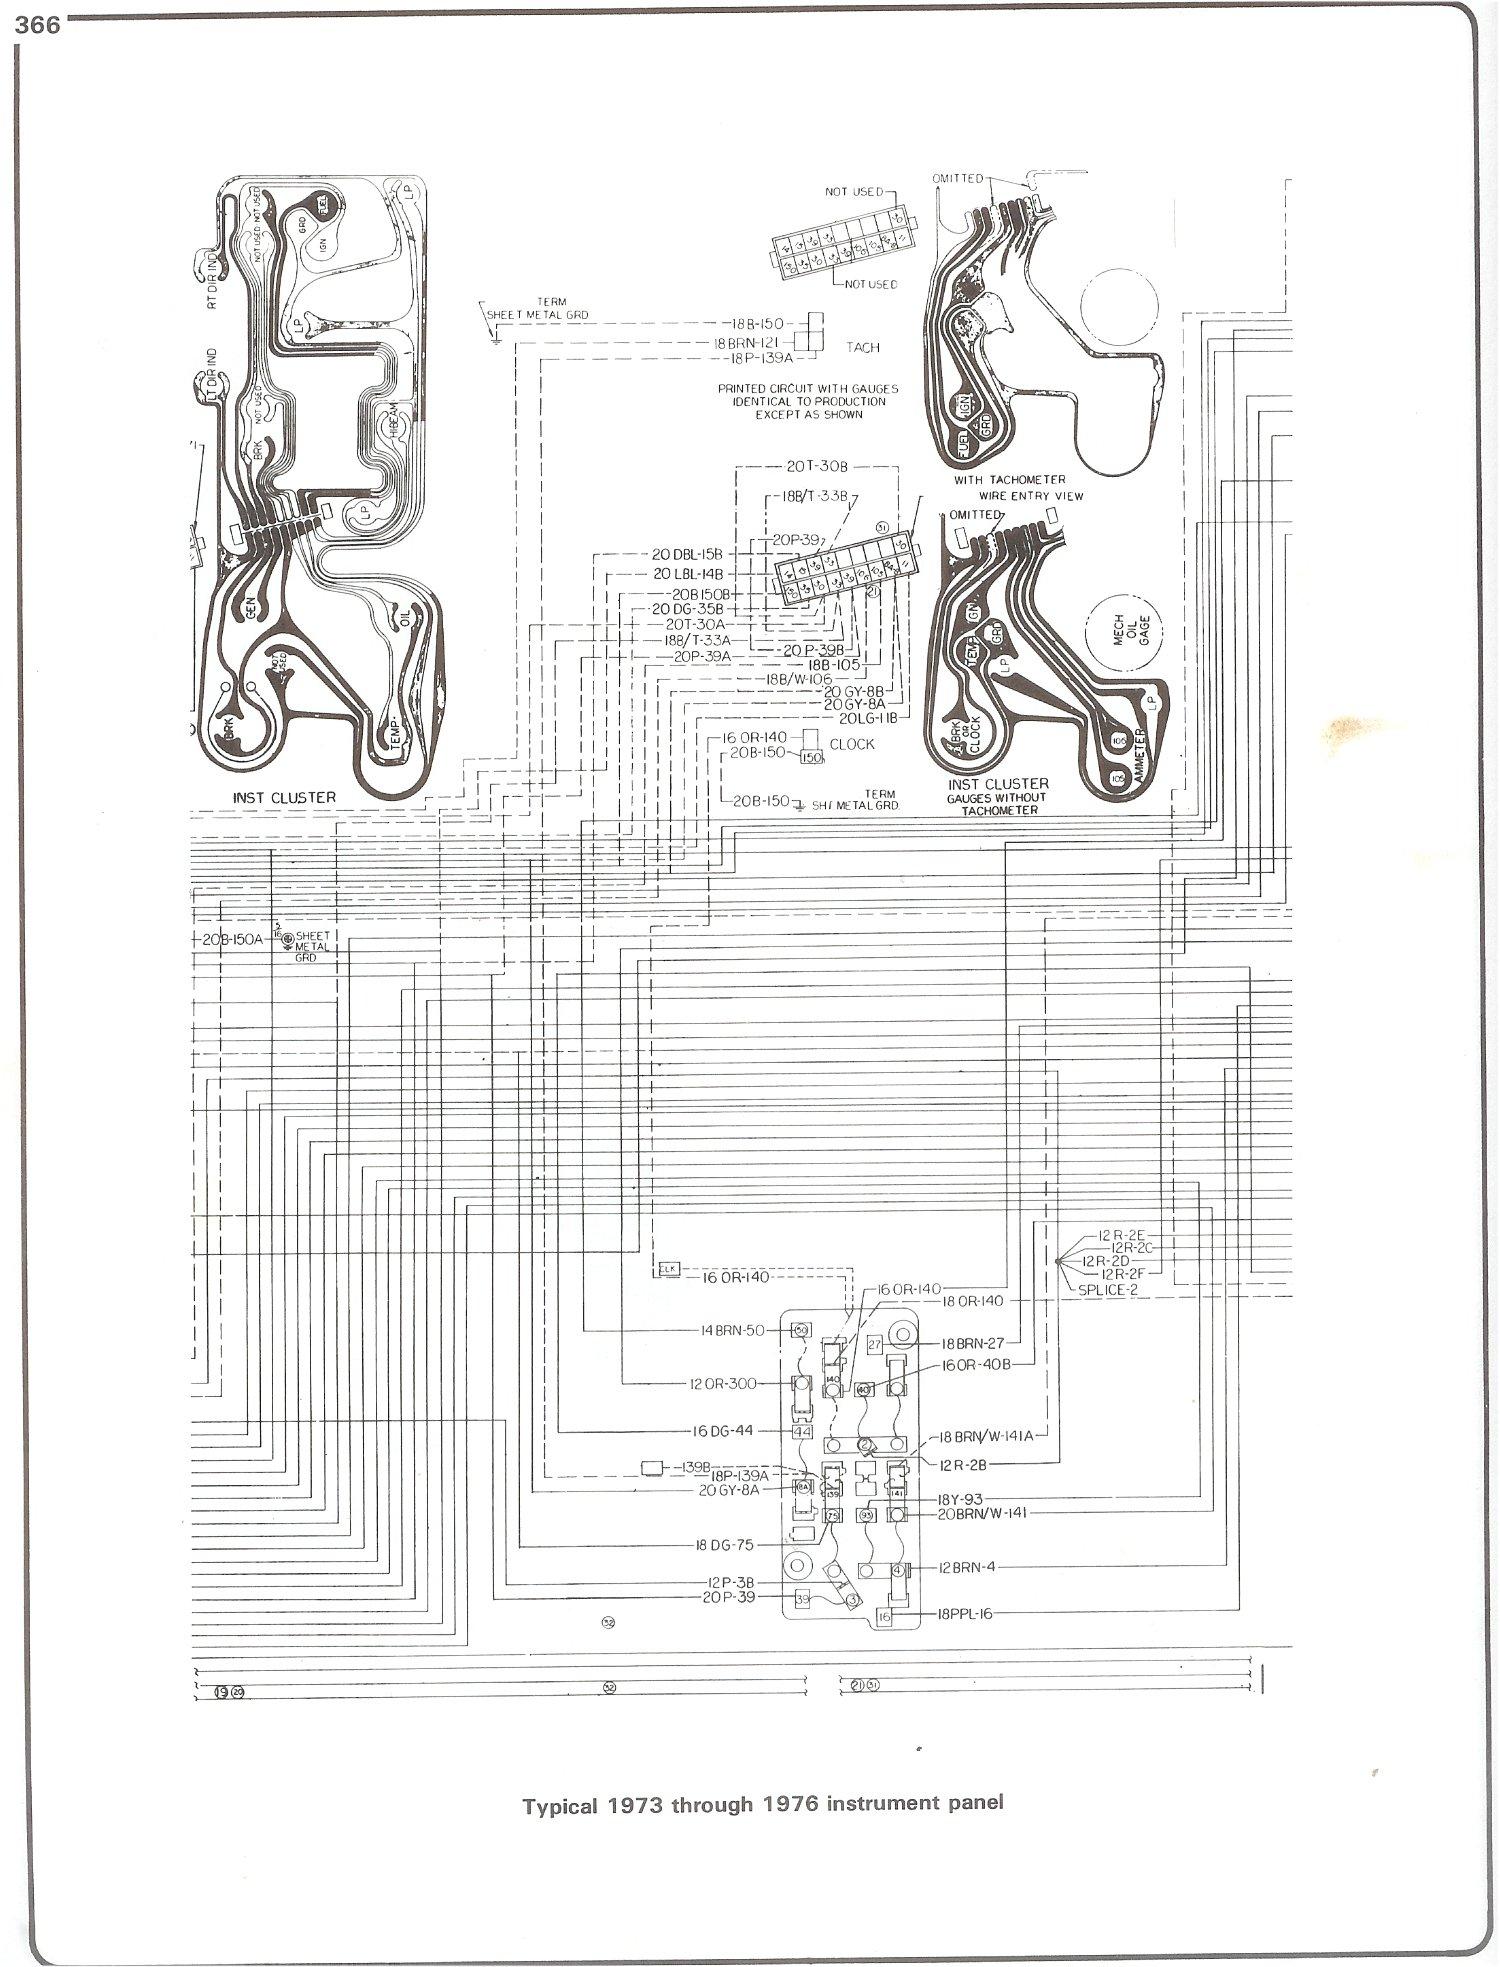 Chevy Truck Hydrulic Trailer Brake Controller Wiring